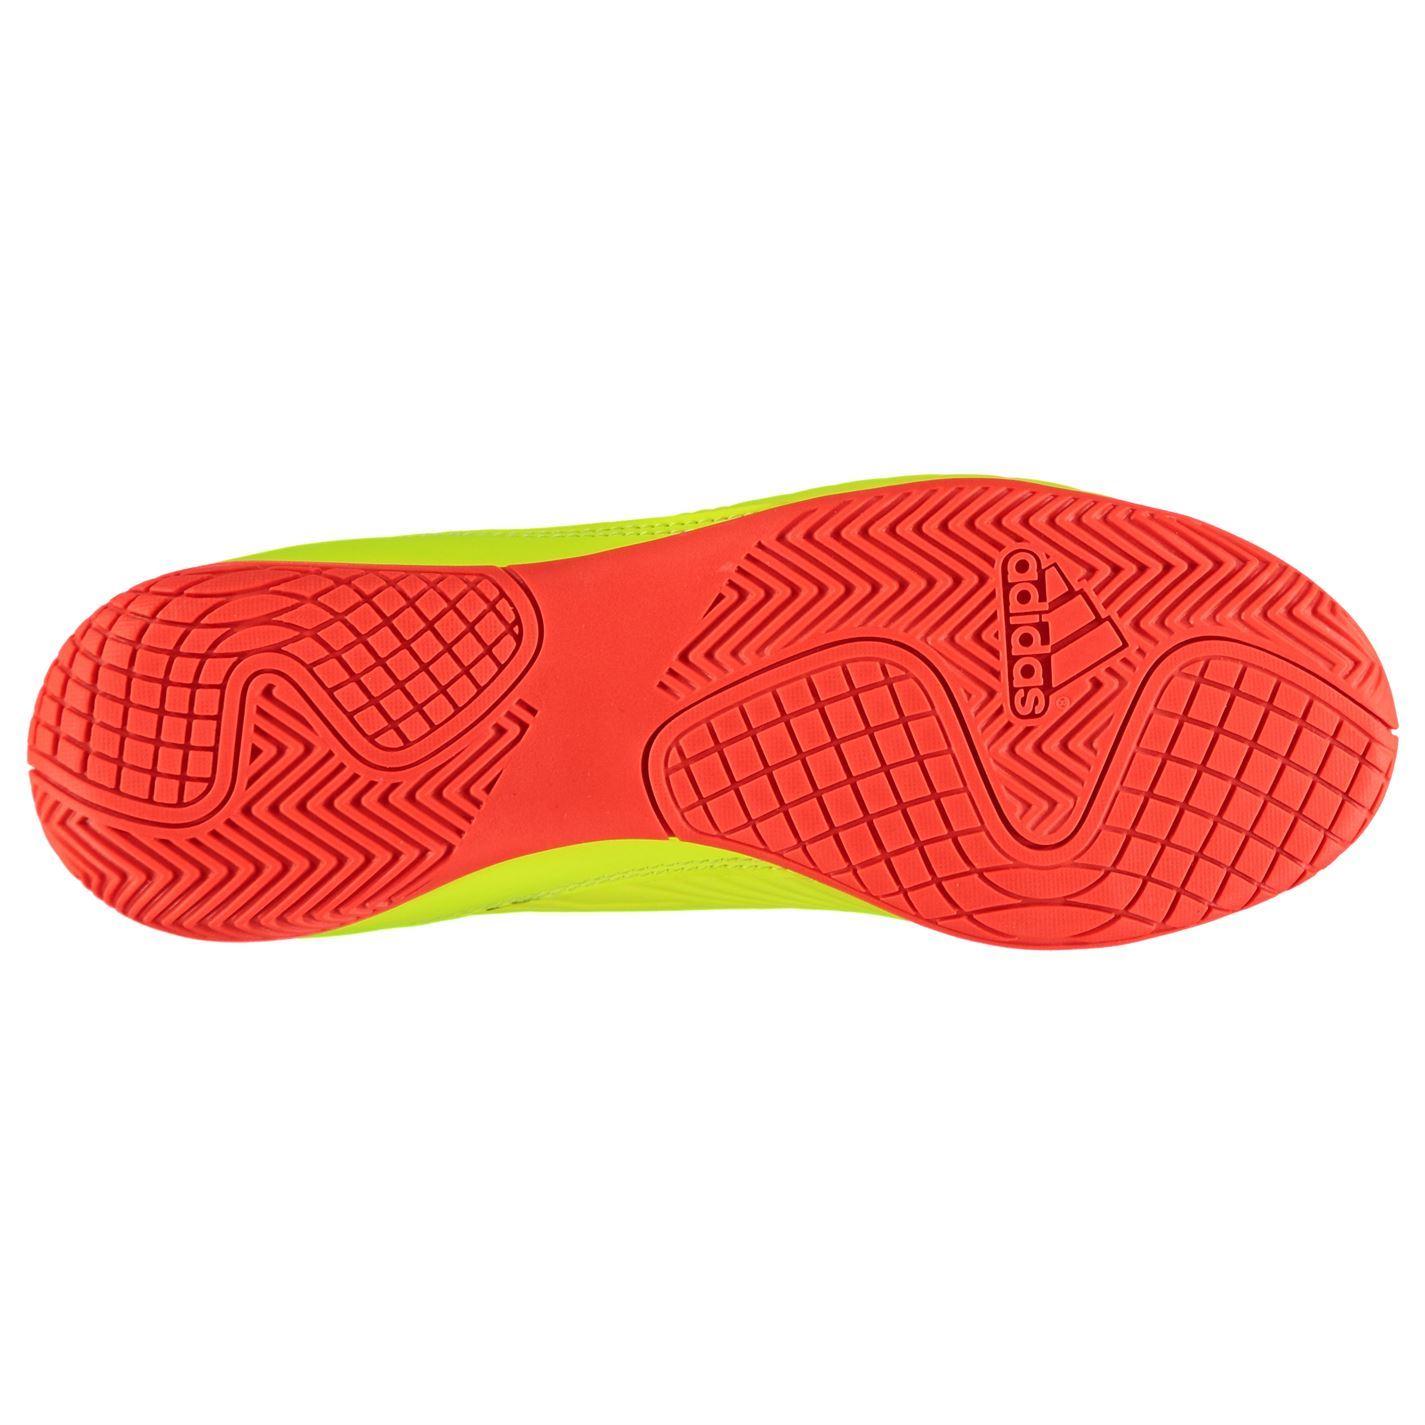 41f5aae9213d ... adidas Predator Tango 18.3 Indoor Football Trainers Juniors Yellow  Soccer Shoes ...